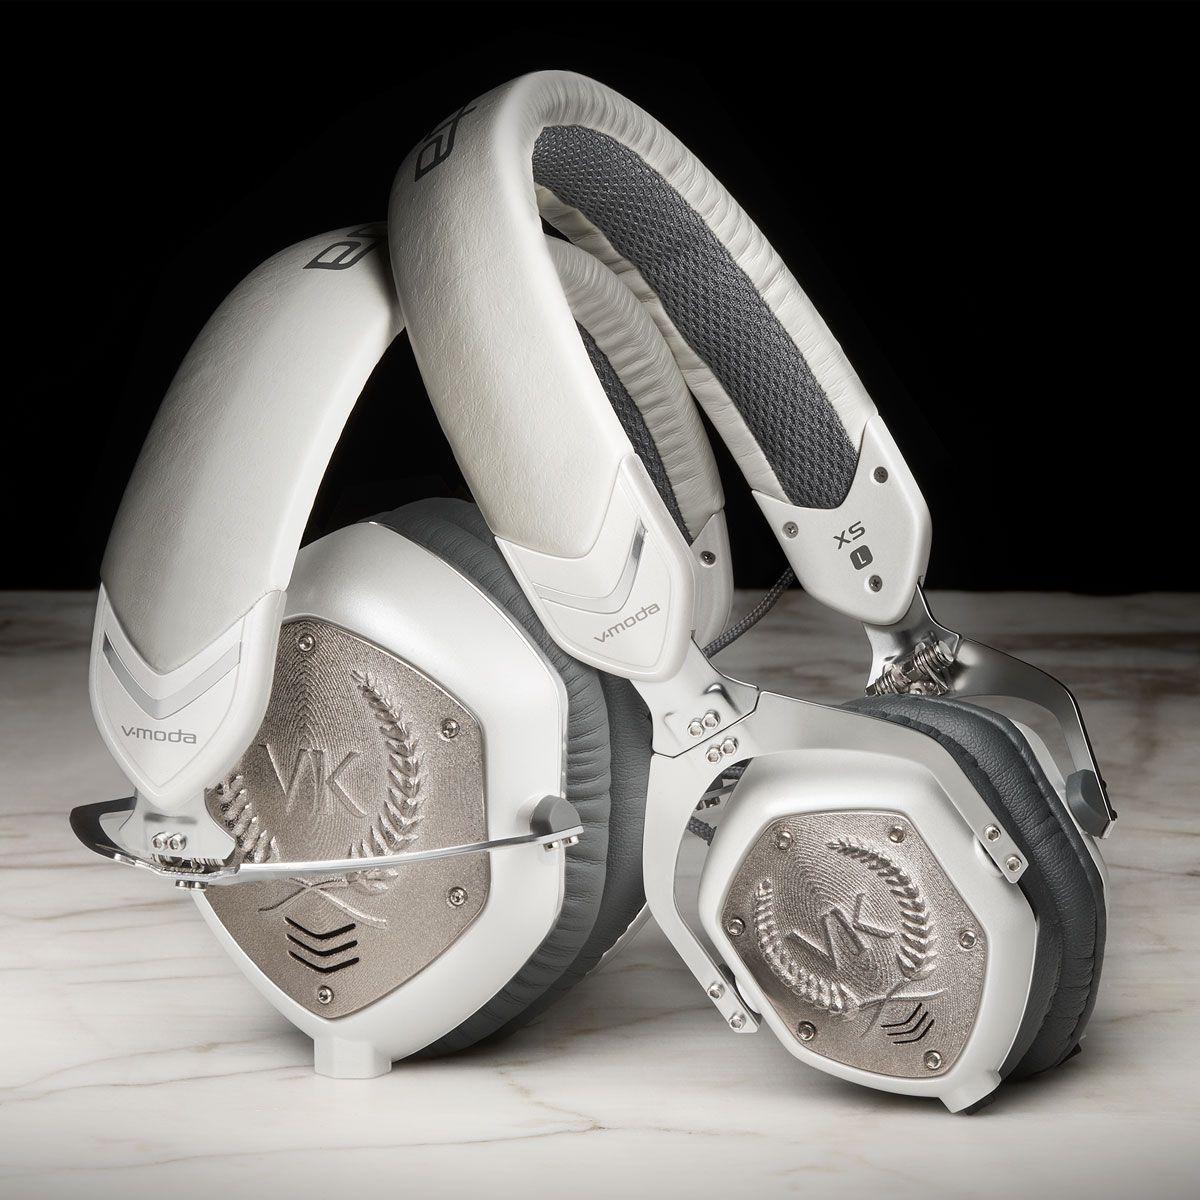 V-MODA 3D-Printed Headphones